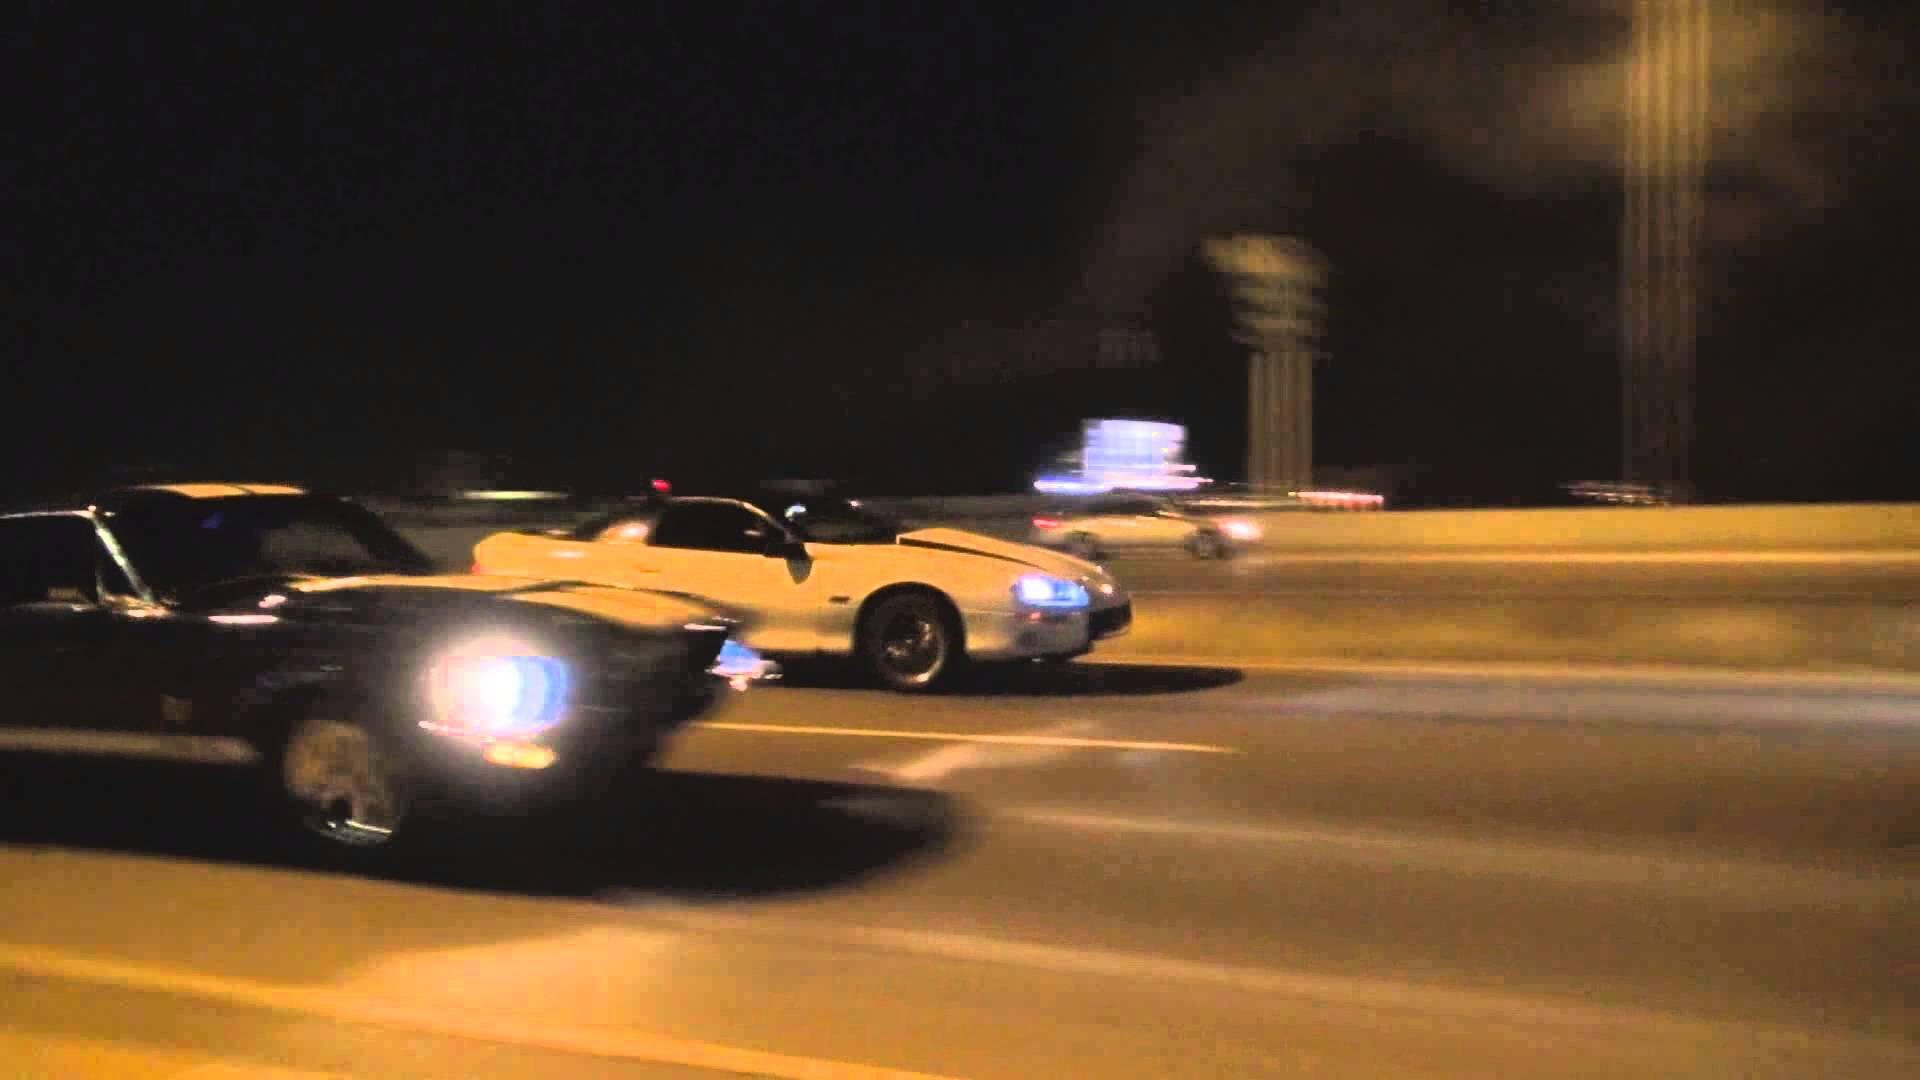 Street Race Gone Bad(Nitrous 67 Mustang vs. 99 Twin Turbo Camaro ...